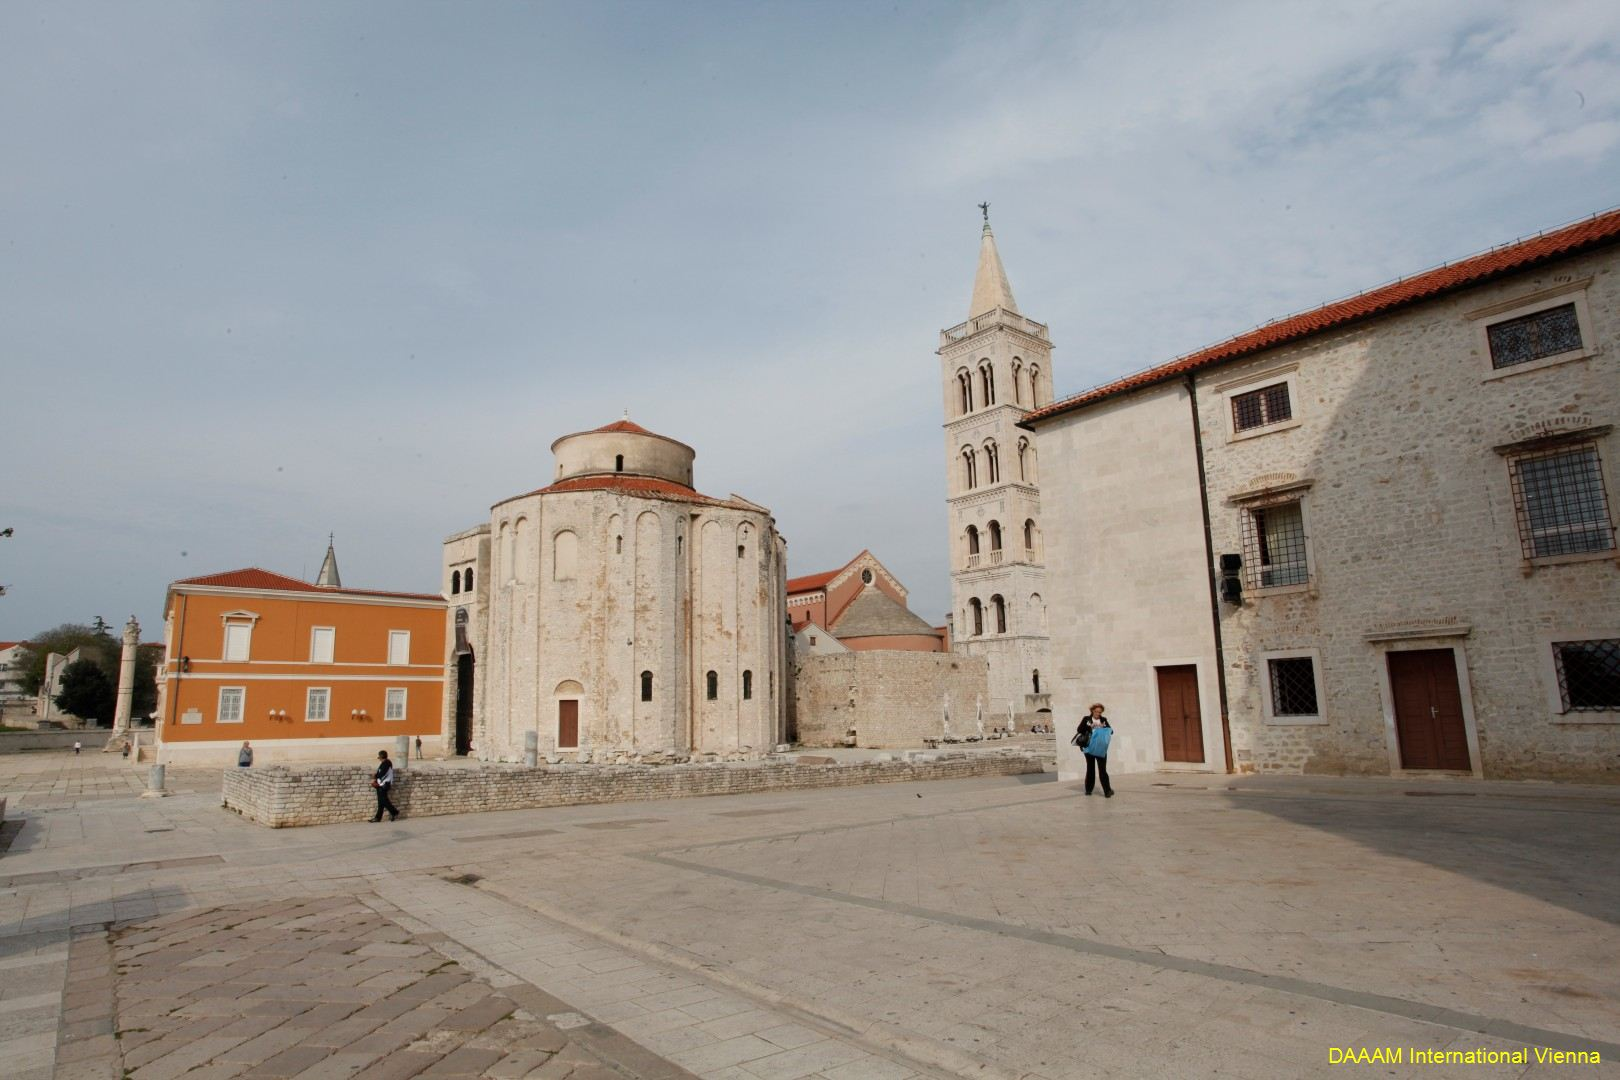 DAAAM_2012_Zadar_00_Zadar_City_033